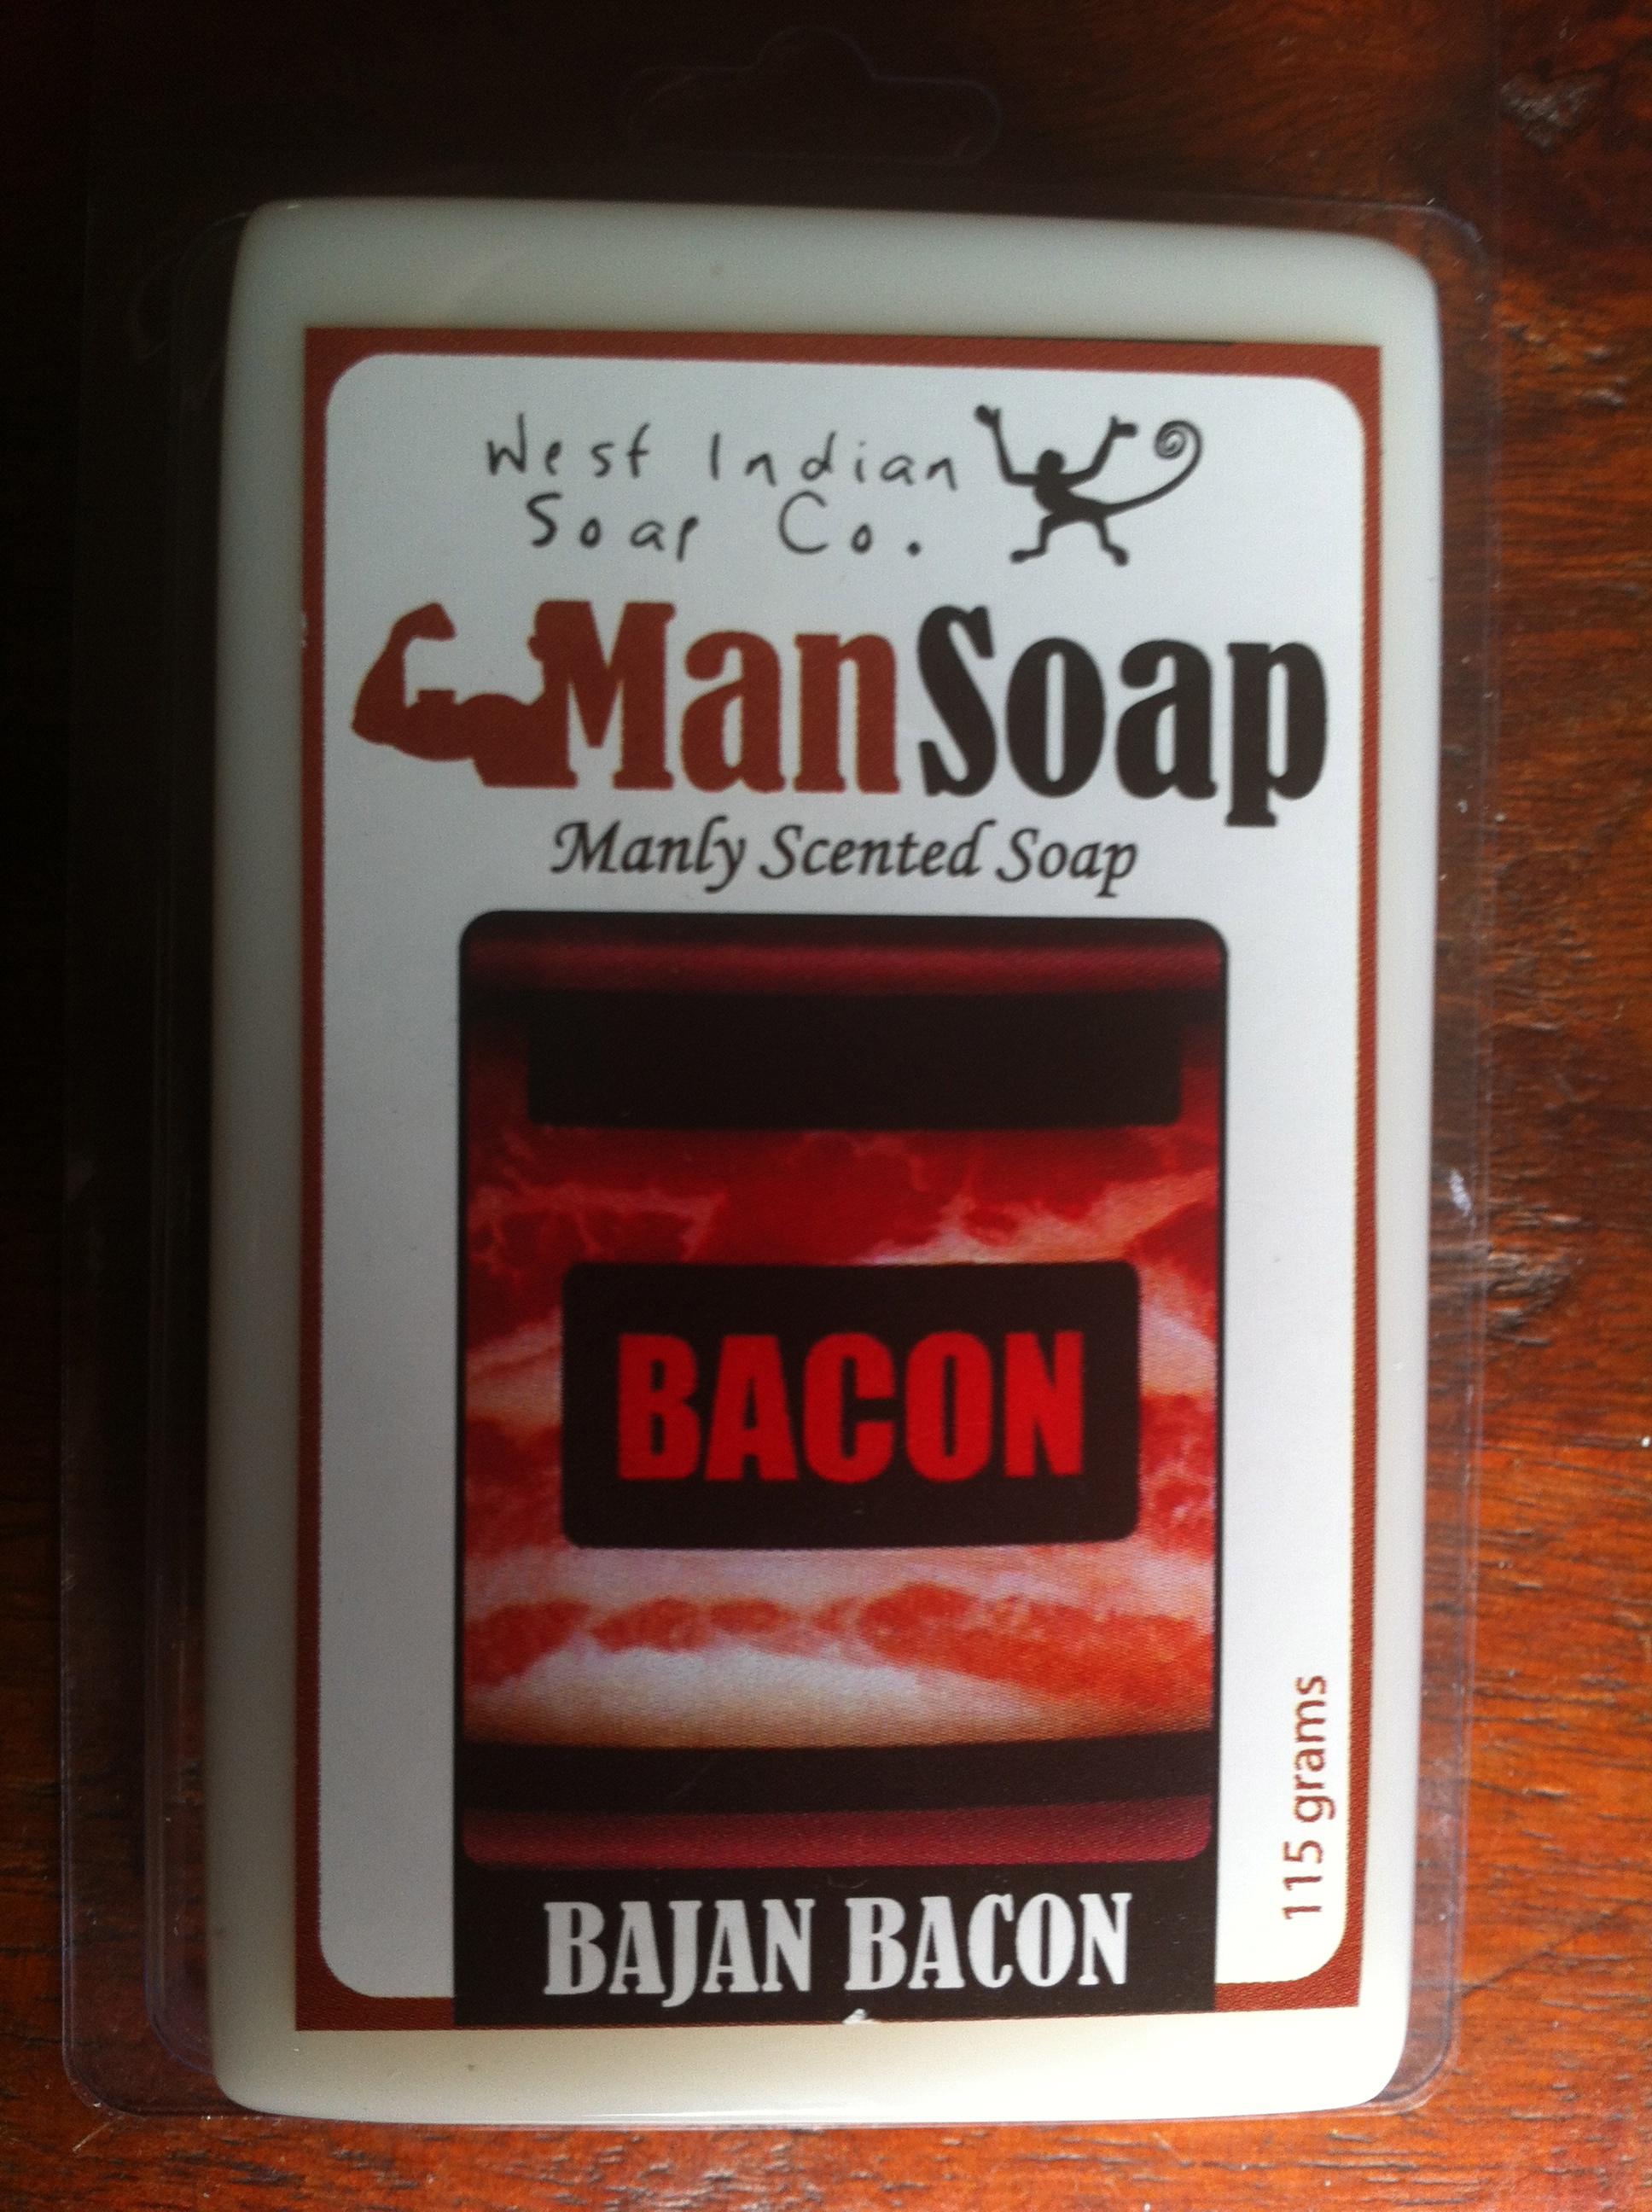 Bajan Bacon